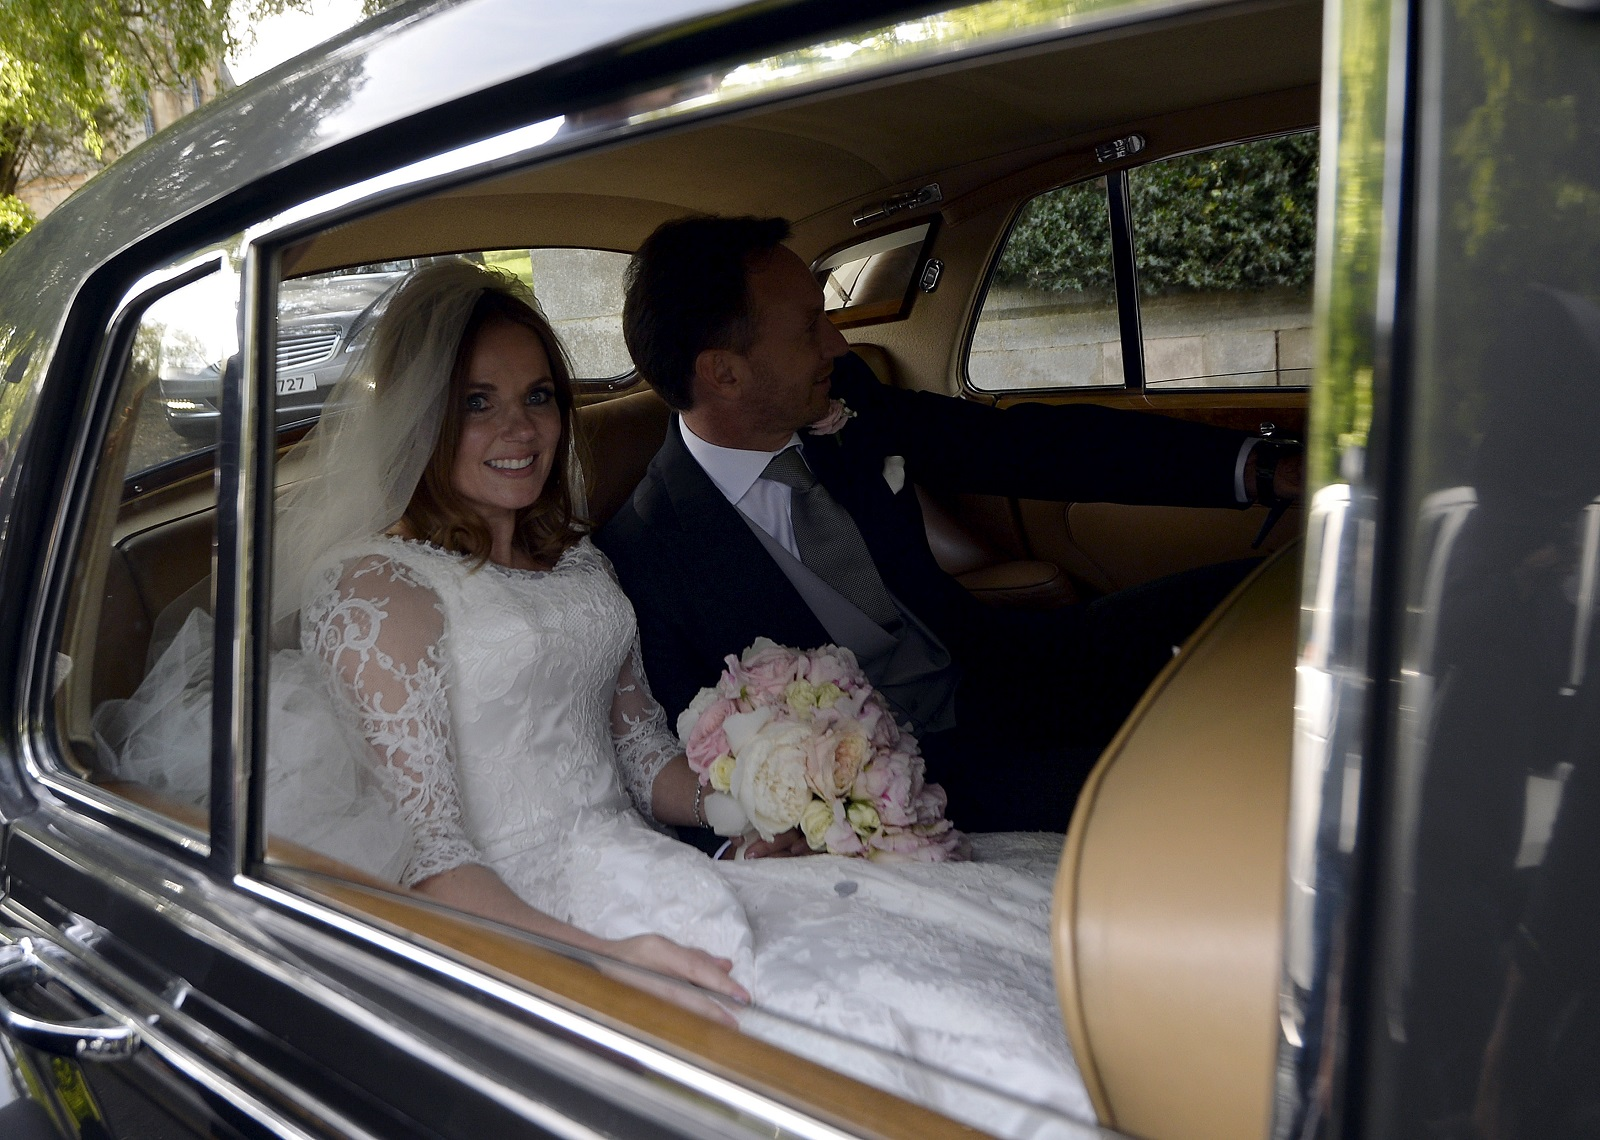 Geri Halliwell gets married to Christian Horner